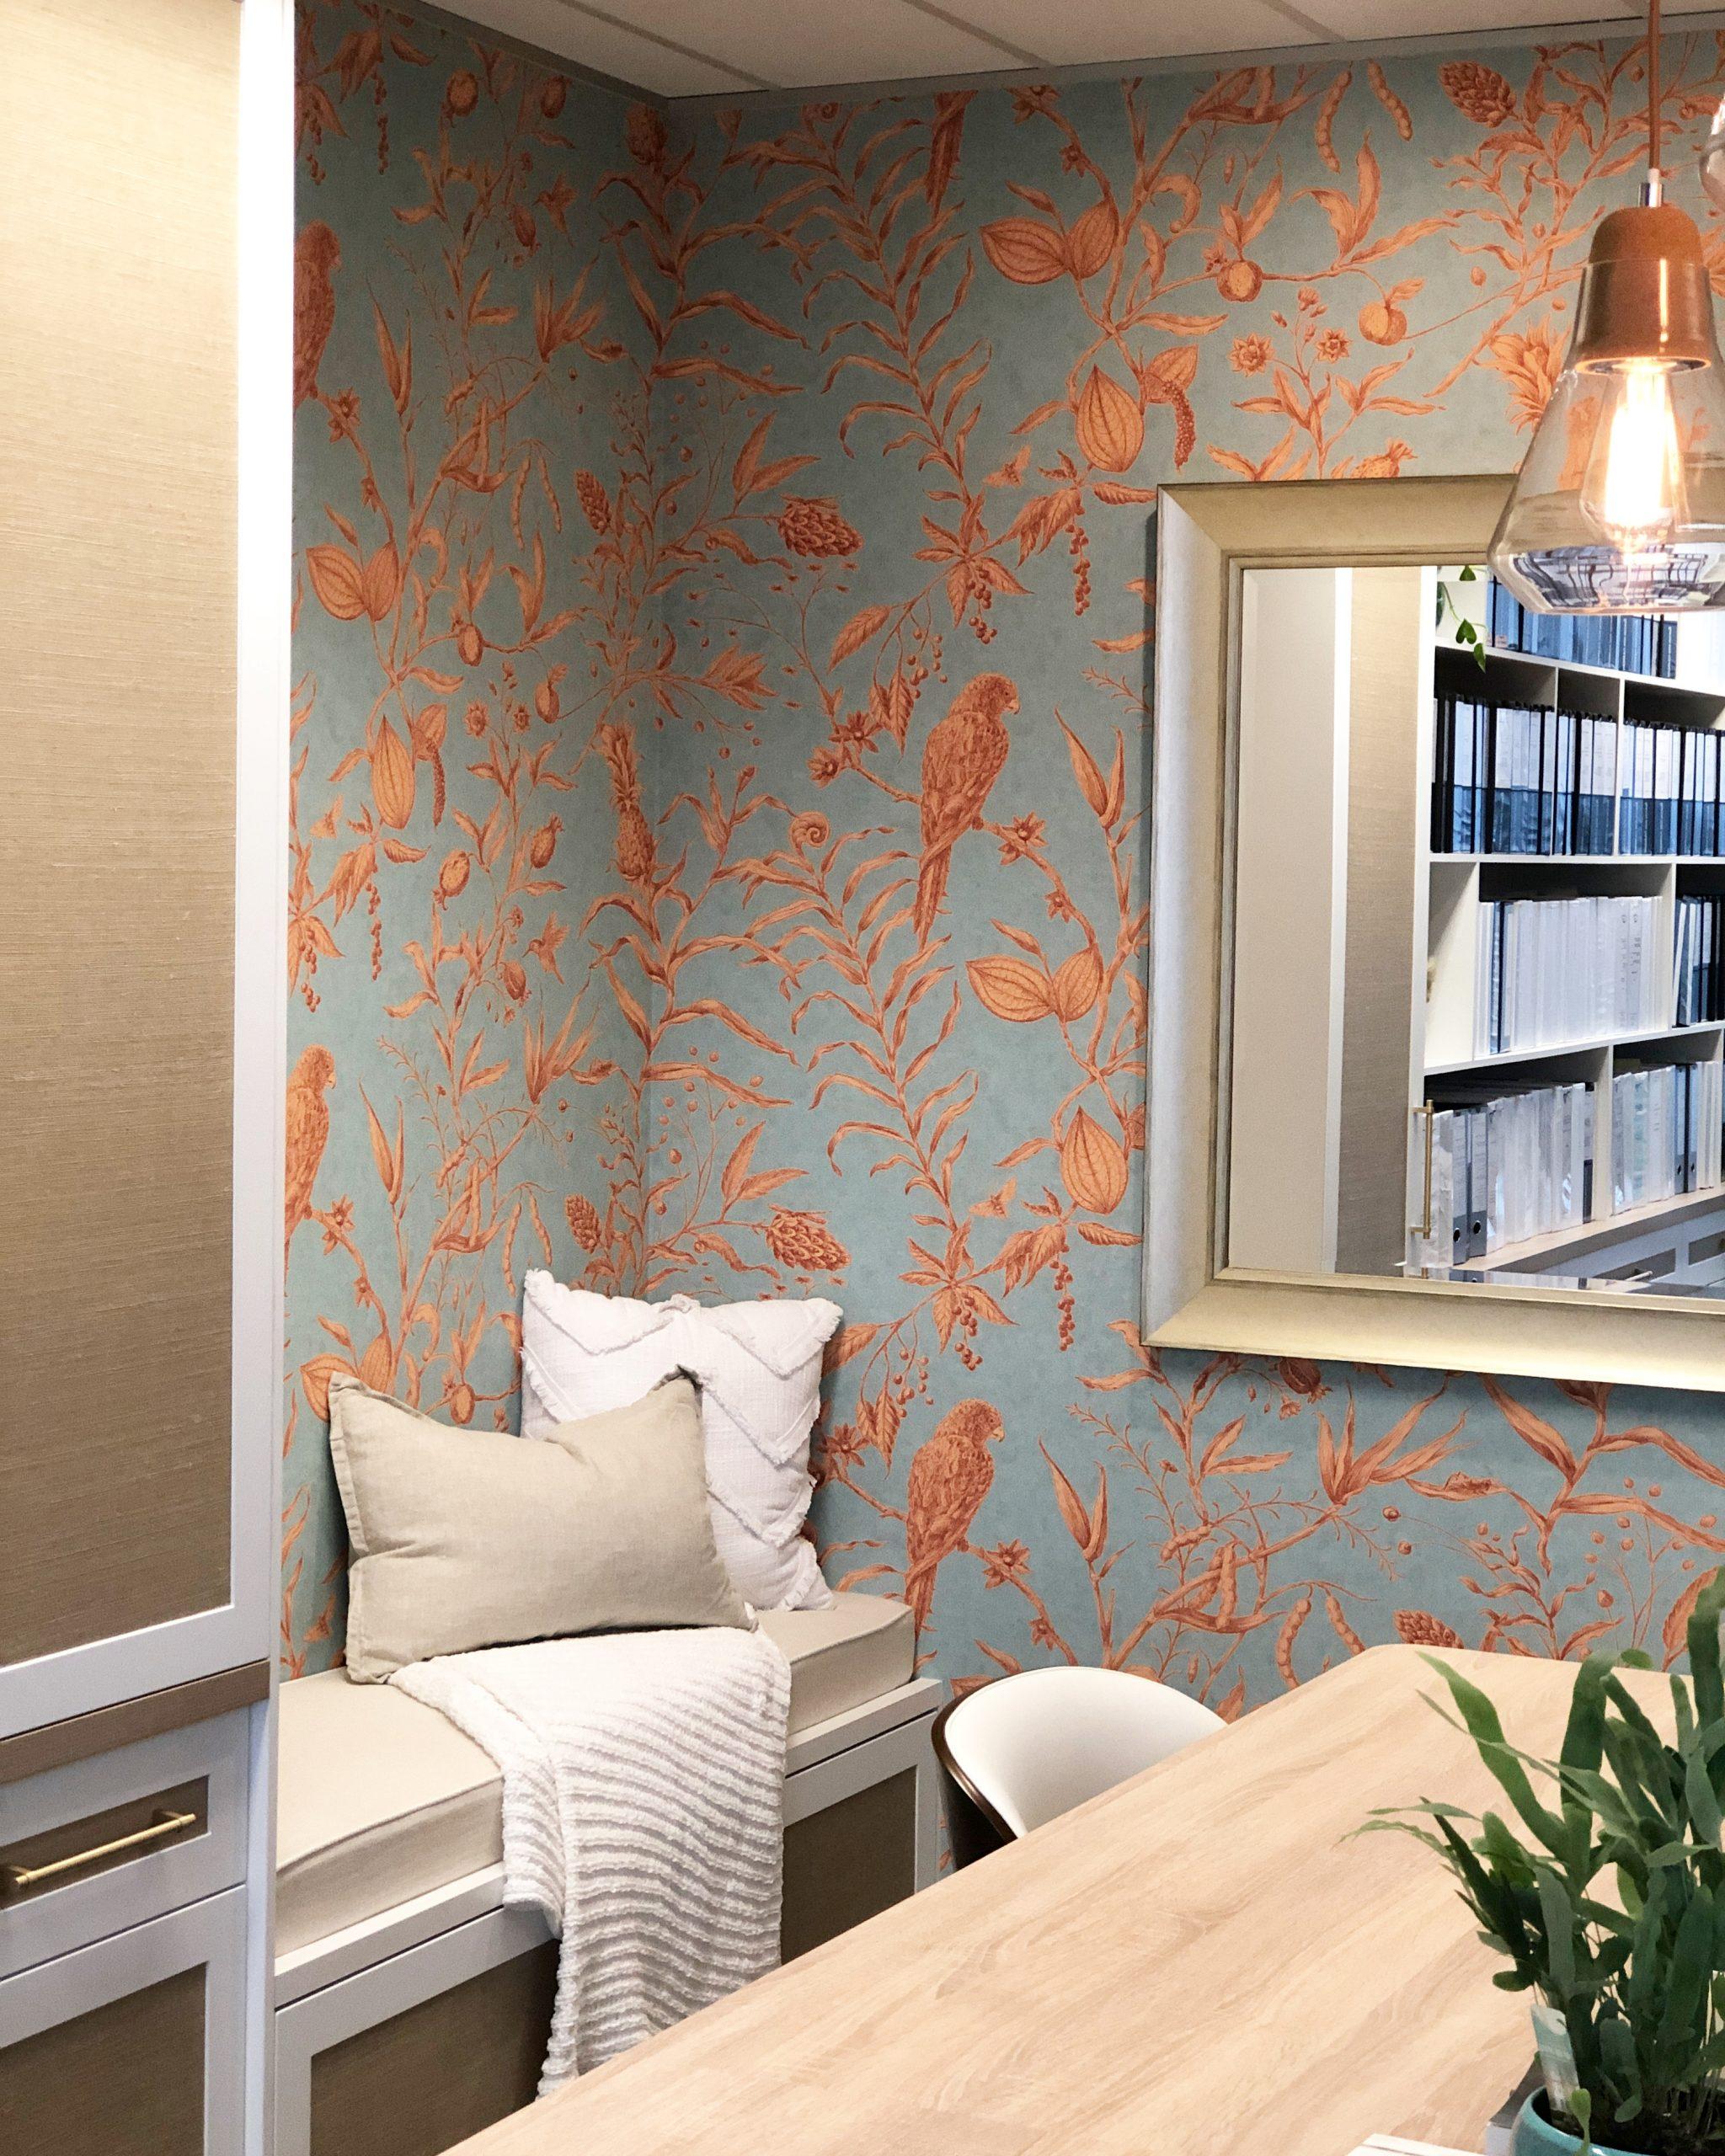 https://www.ivyandfinch.com.au/wp-content/uploads/2021/02/Interior-Design-Brisbane-City-Office-1-scaled.jpeg